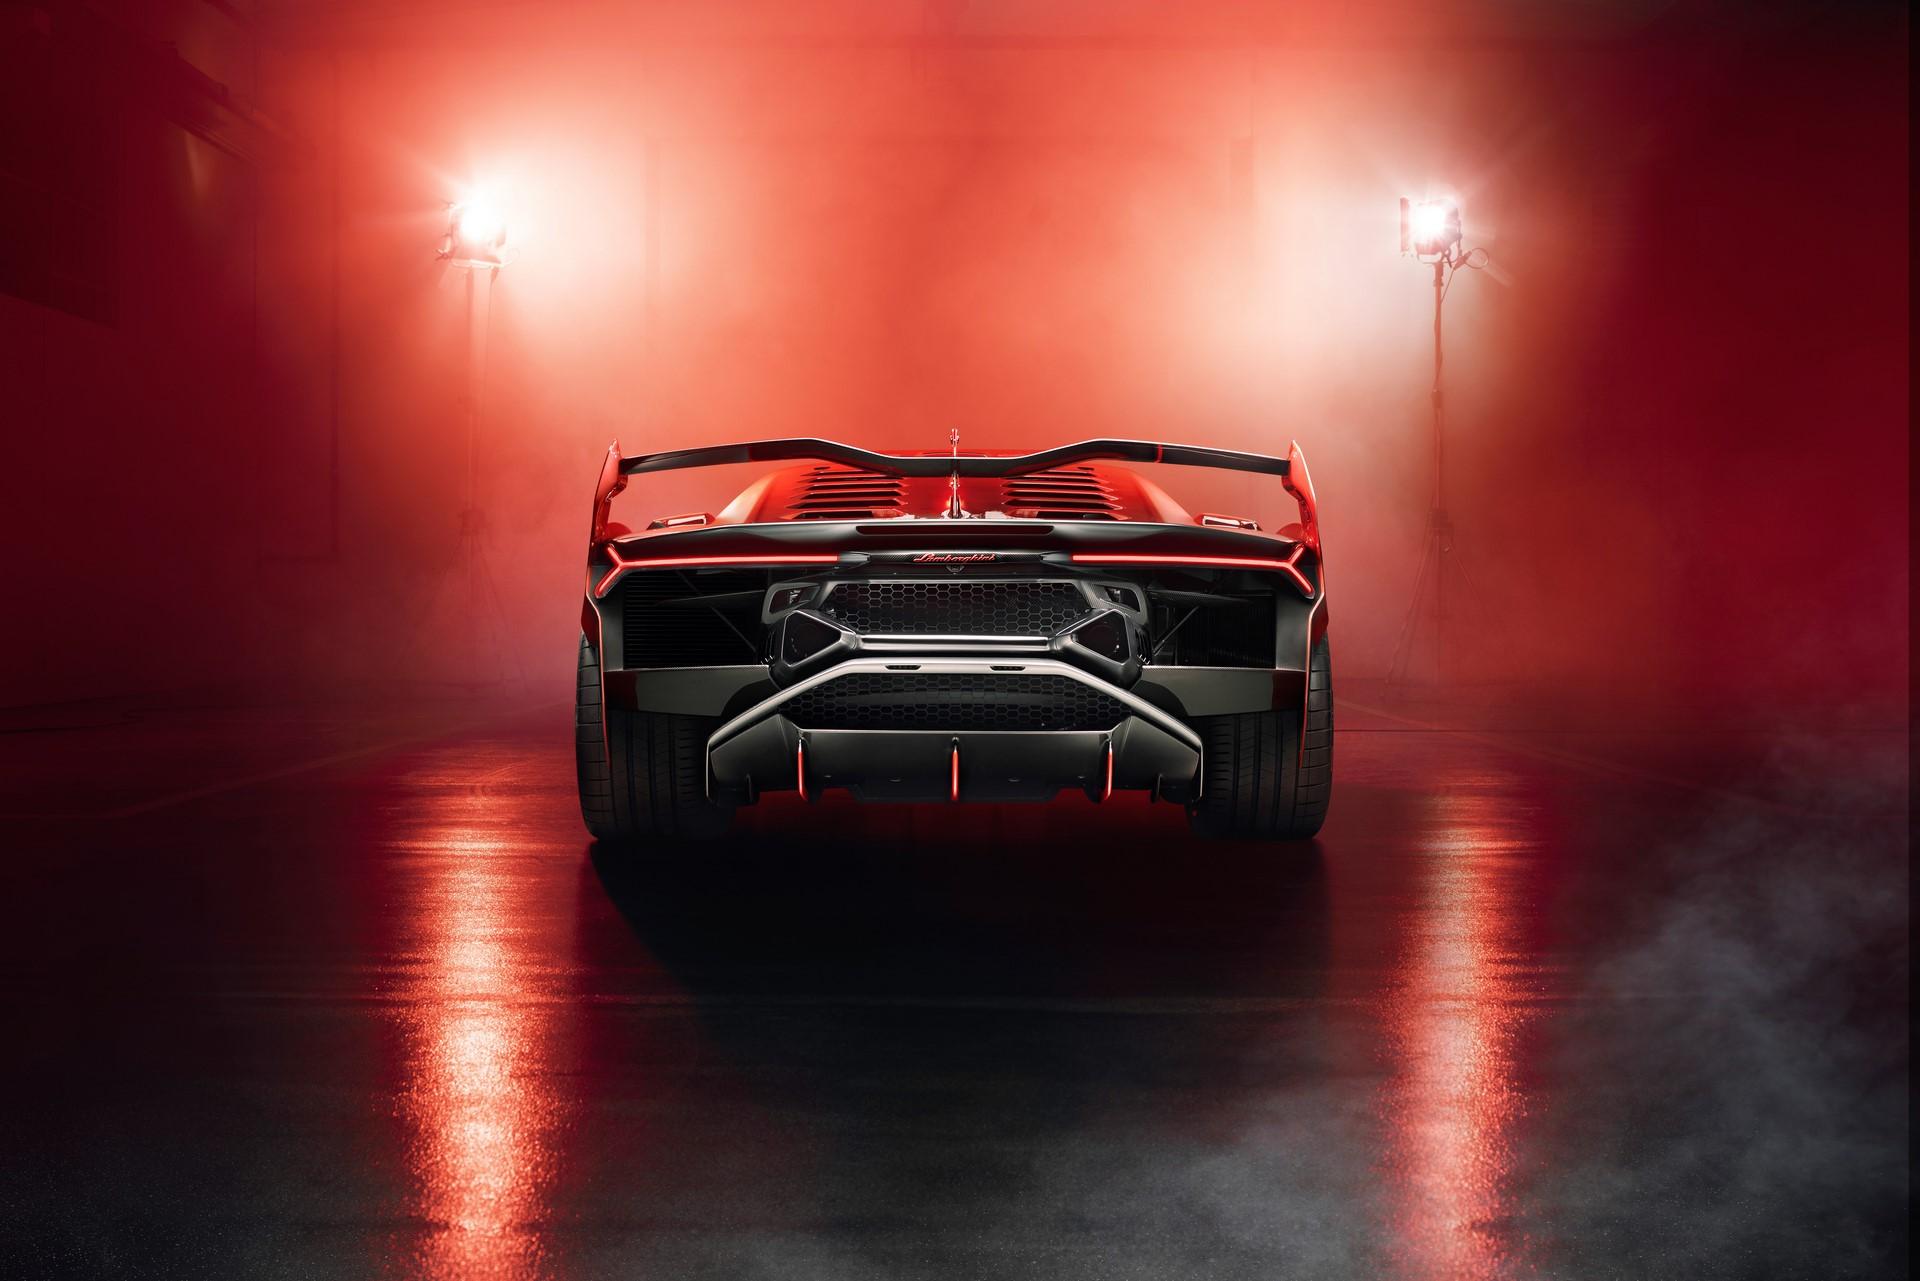 Lamborghini SC18 (8)